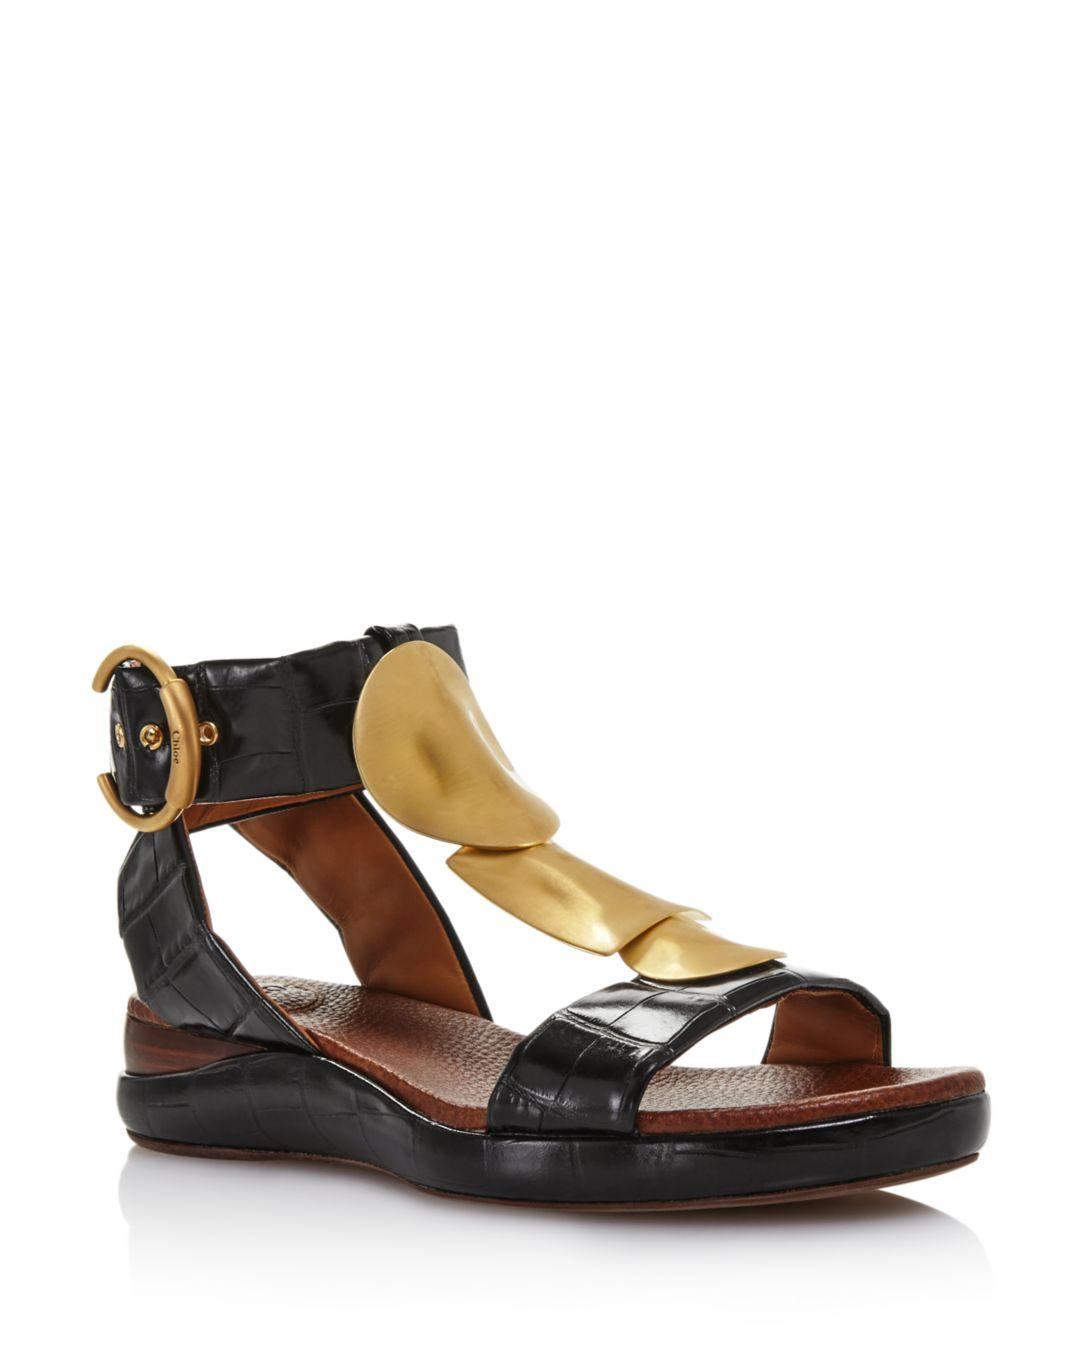 487480ae663cfd Lyst - Chloé Women s Wanda Flat Sandals in Black